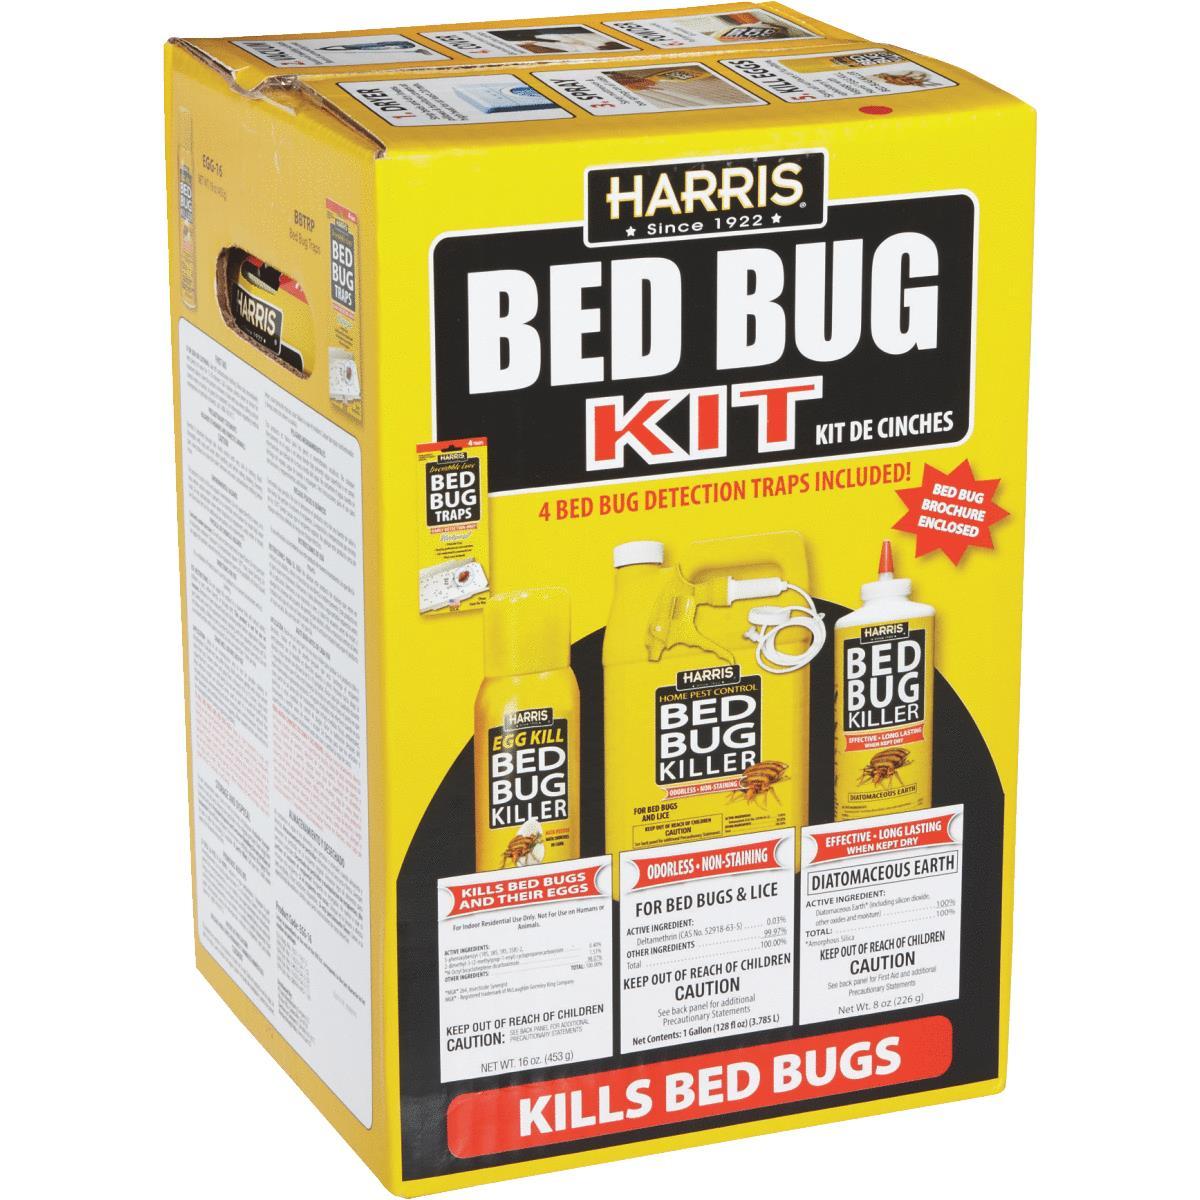 harris bedbug killer kit - walmart